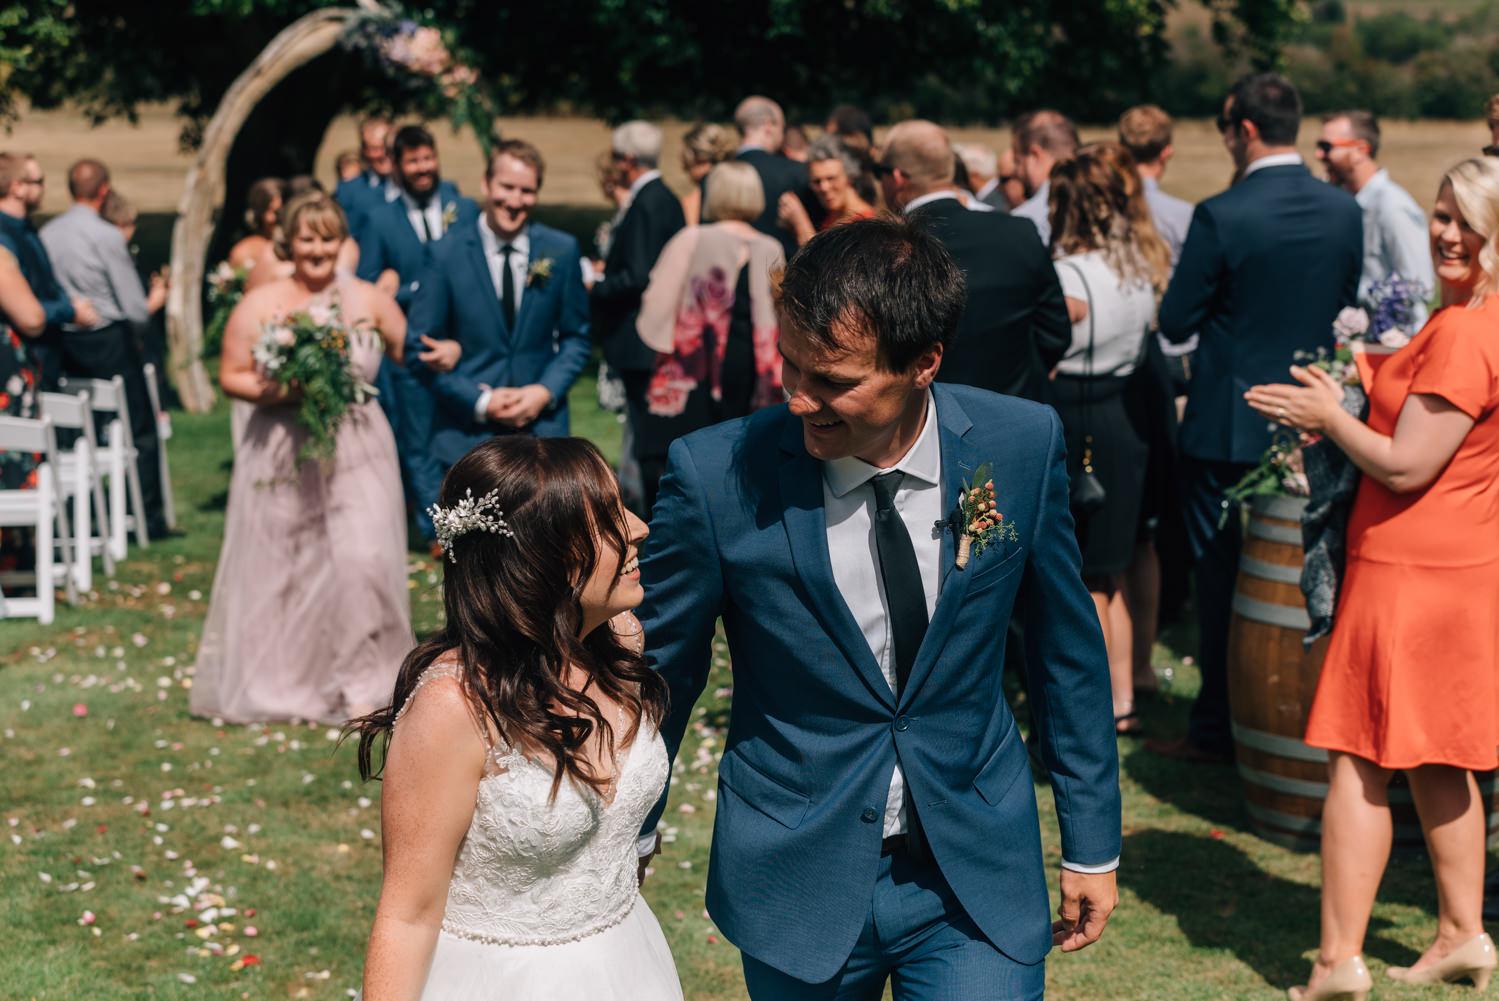 Quamby-Wedding-Photographer-84.jpg